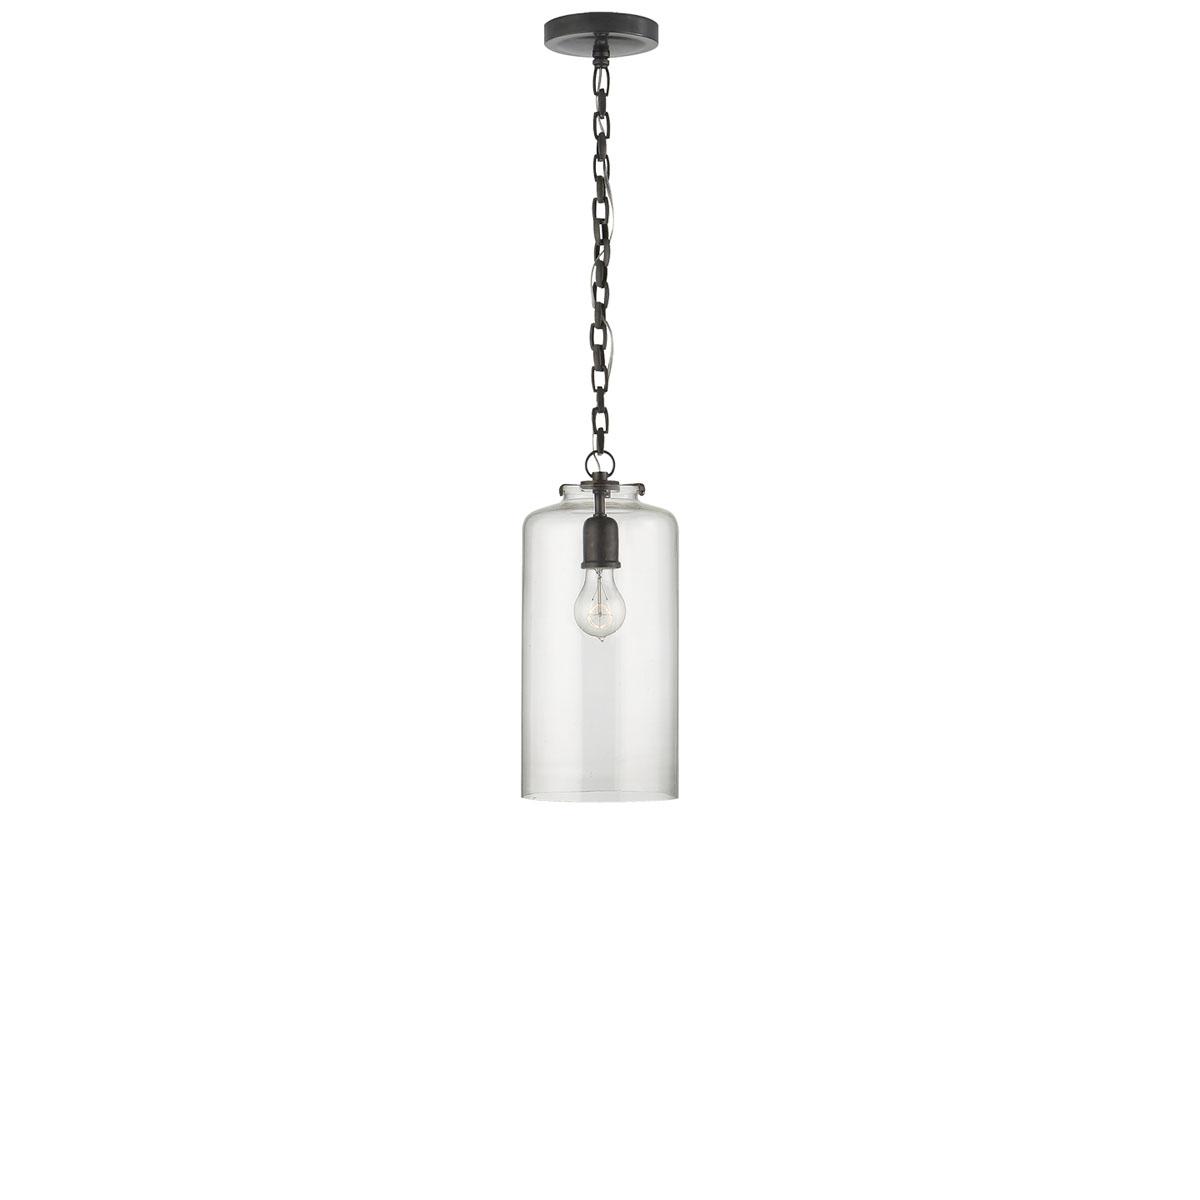 Visual comfort katie cylinder pendant pendant fixture neenas lighting bronze finish clear glass shade chevronleft chevronright katie cylinder pendant aloadofball Choice Image